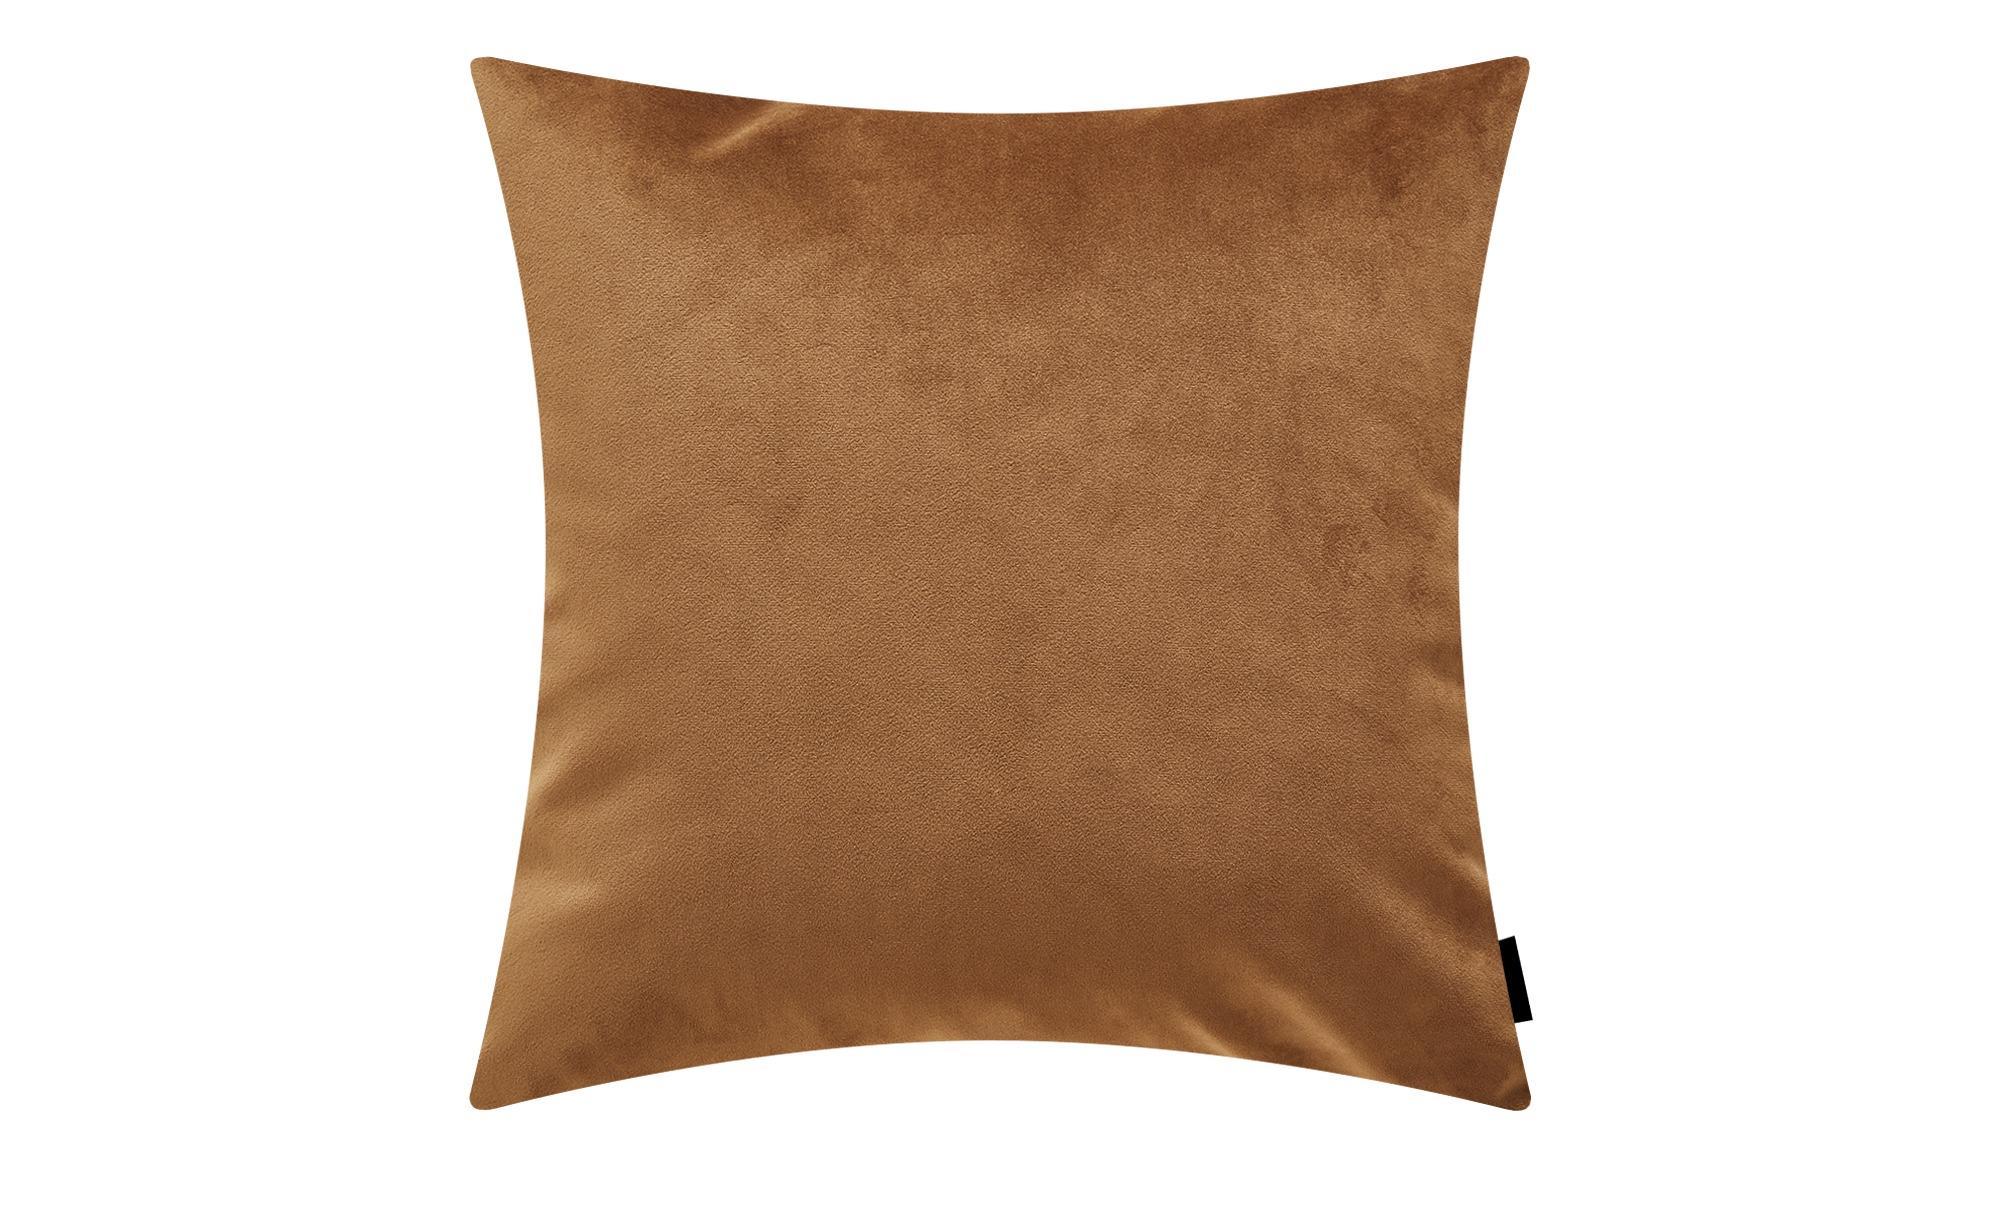 thermo sonnenschutz 47x91 5 wei bkh silvertabby. Black Bedroom Furniture Sets. Home Design Ideas